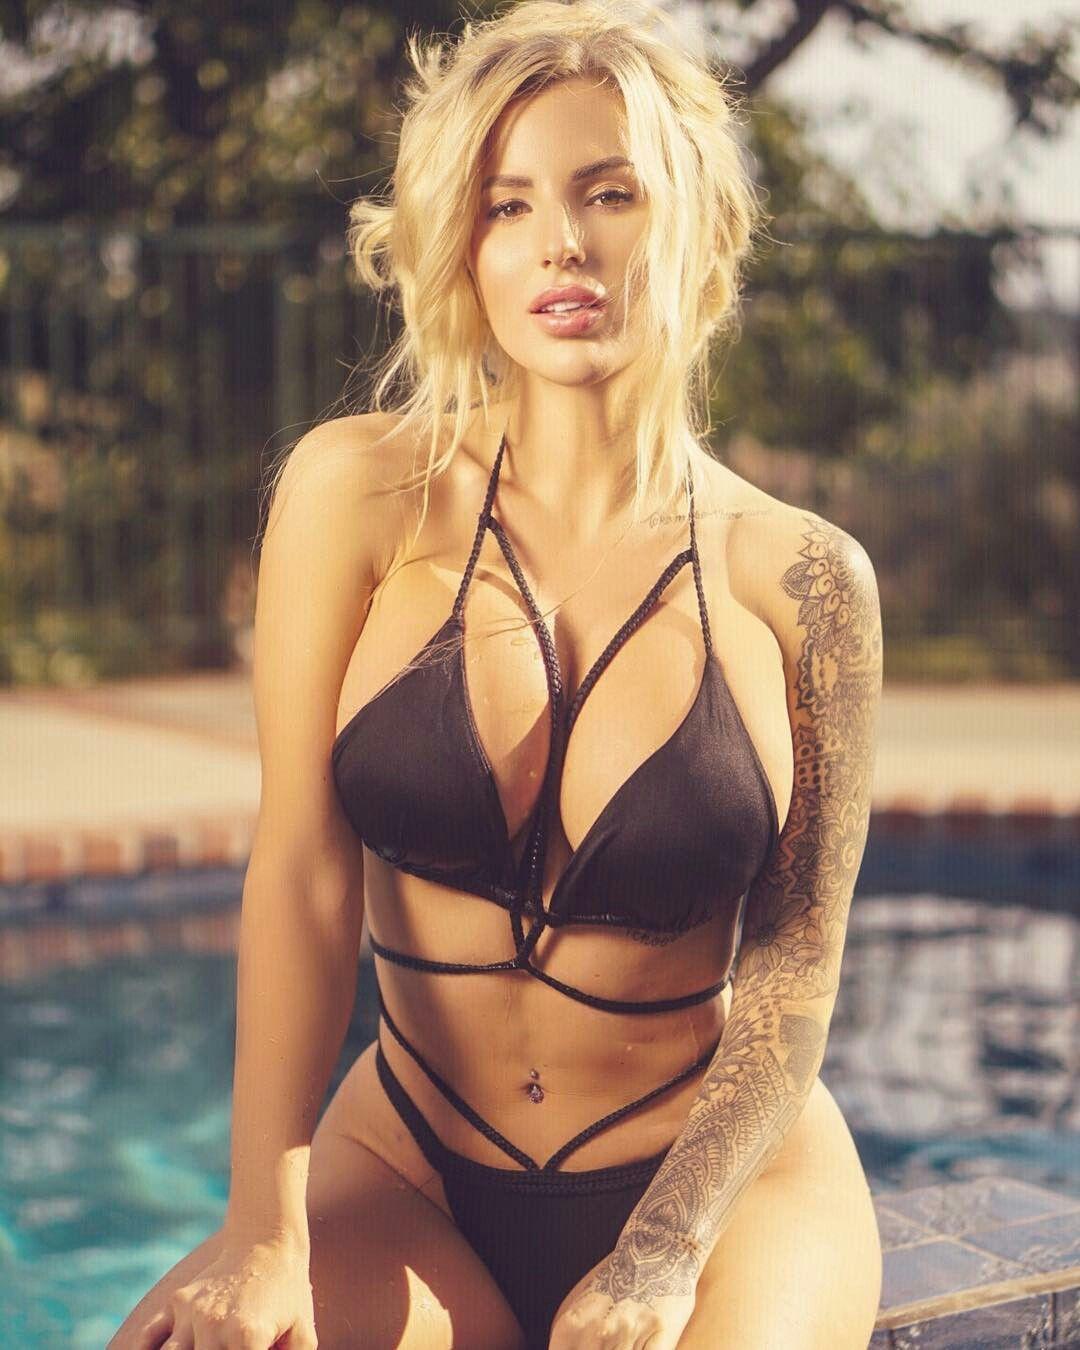 Cleavage Elena Satine nude (82 foto and video), Pussy, Sideboobs, Instagram, in bikini 2006